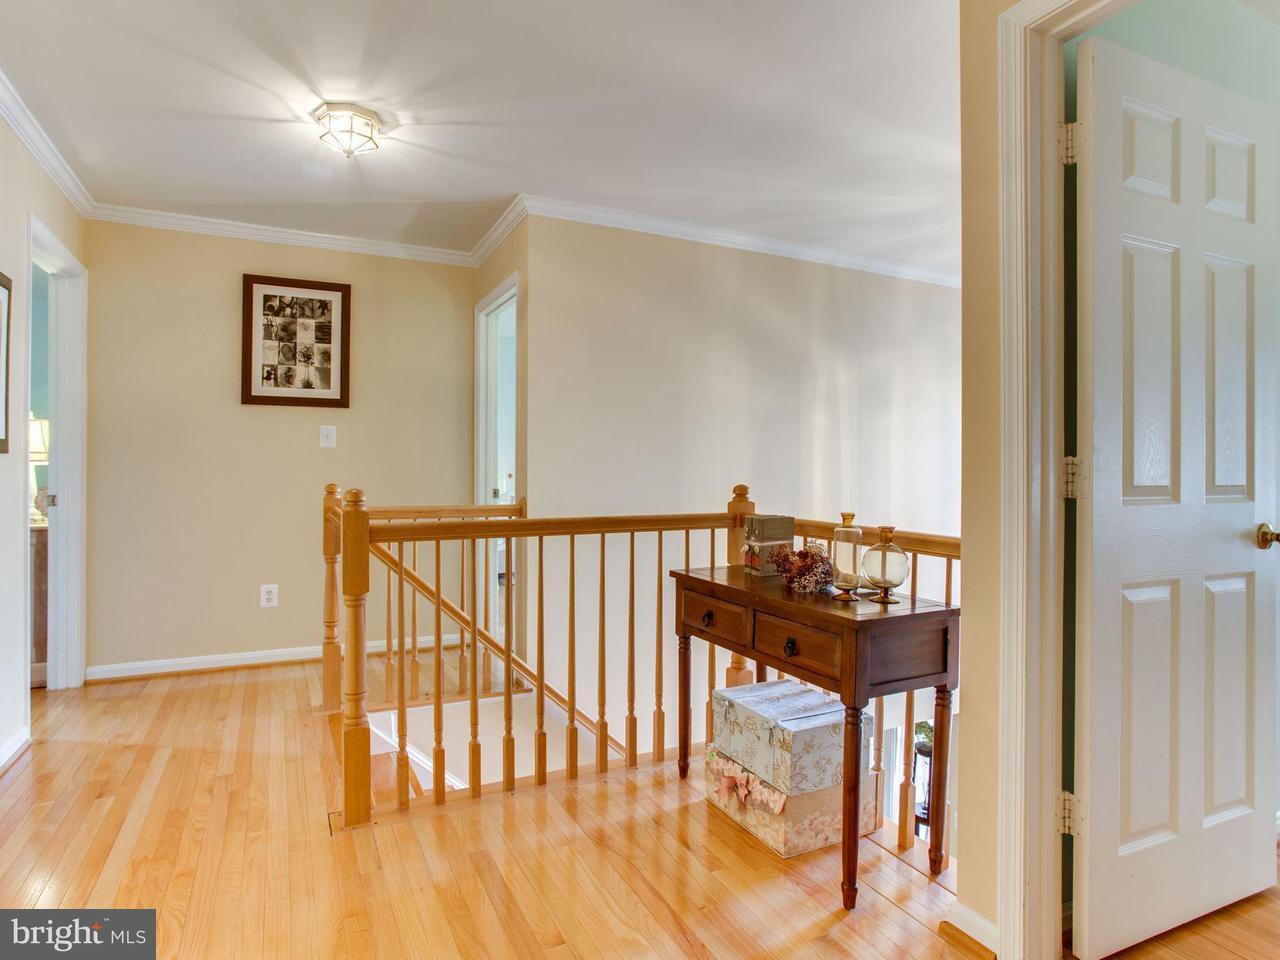 Additional photo for property listing at 4219 Trowbridge Street 4219 Trowbridge Street Fairfax, Βιρτζινια 22030 Ηνωμενεσ Πολιτειεσ